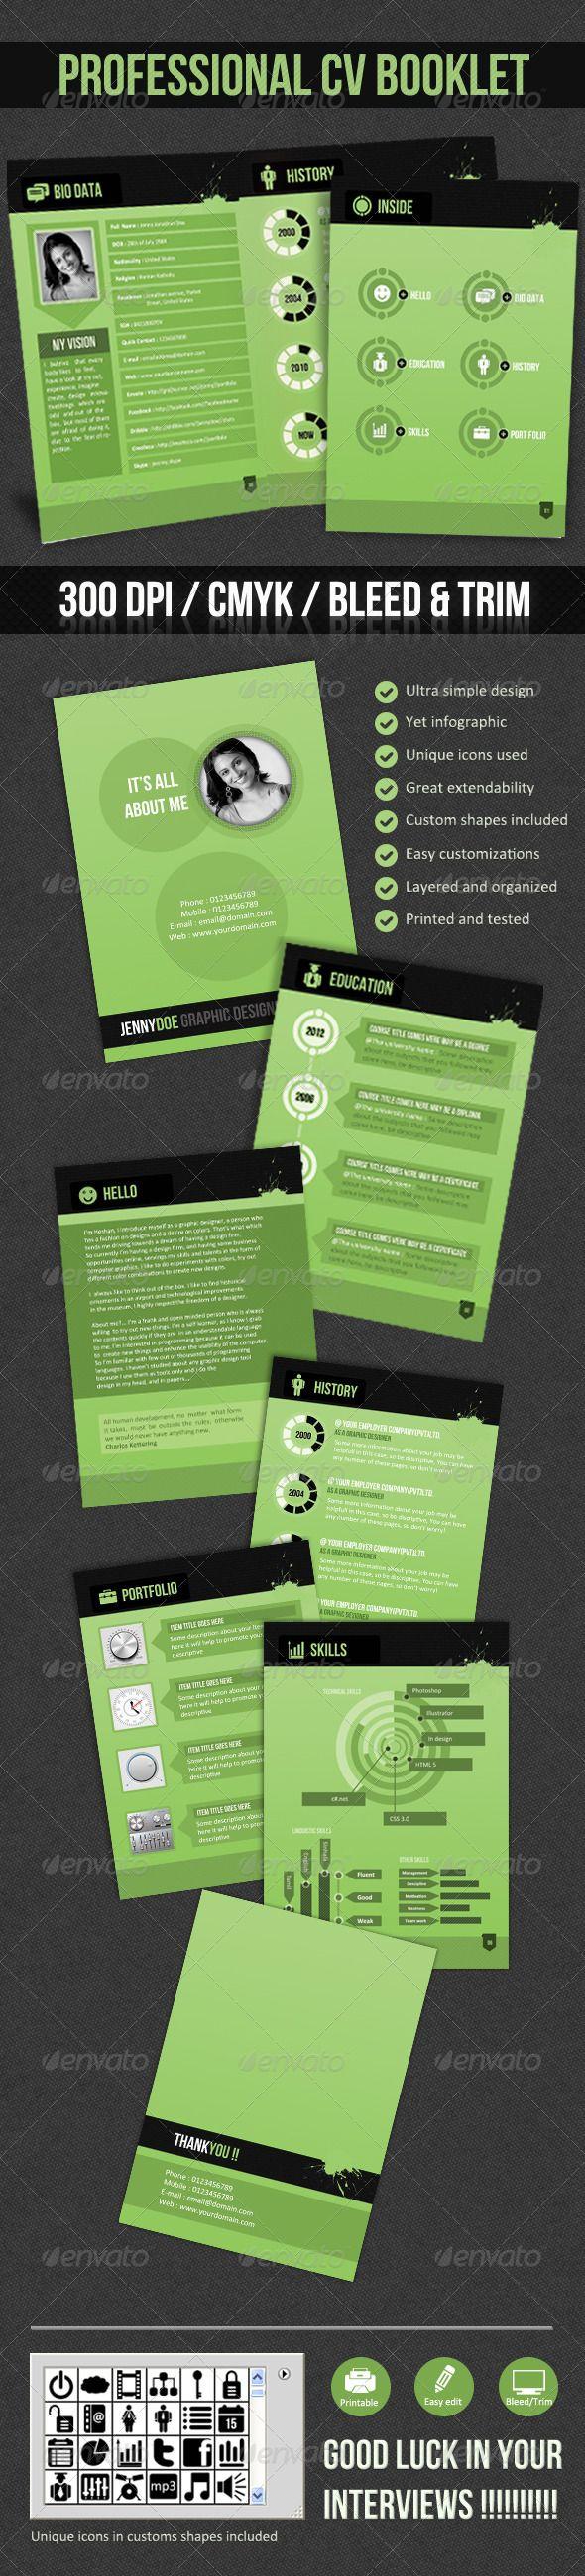 Professional CV Booklet- (Greenish CV) - GraphicRiver Item for Sale